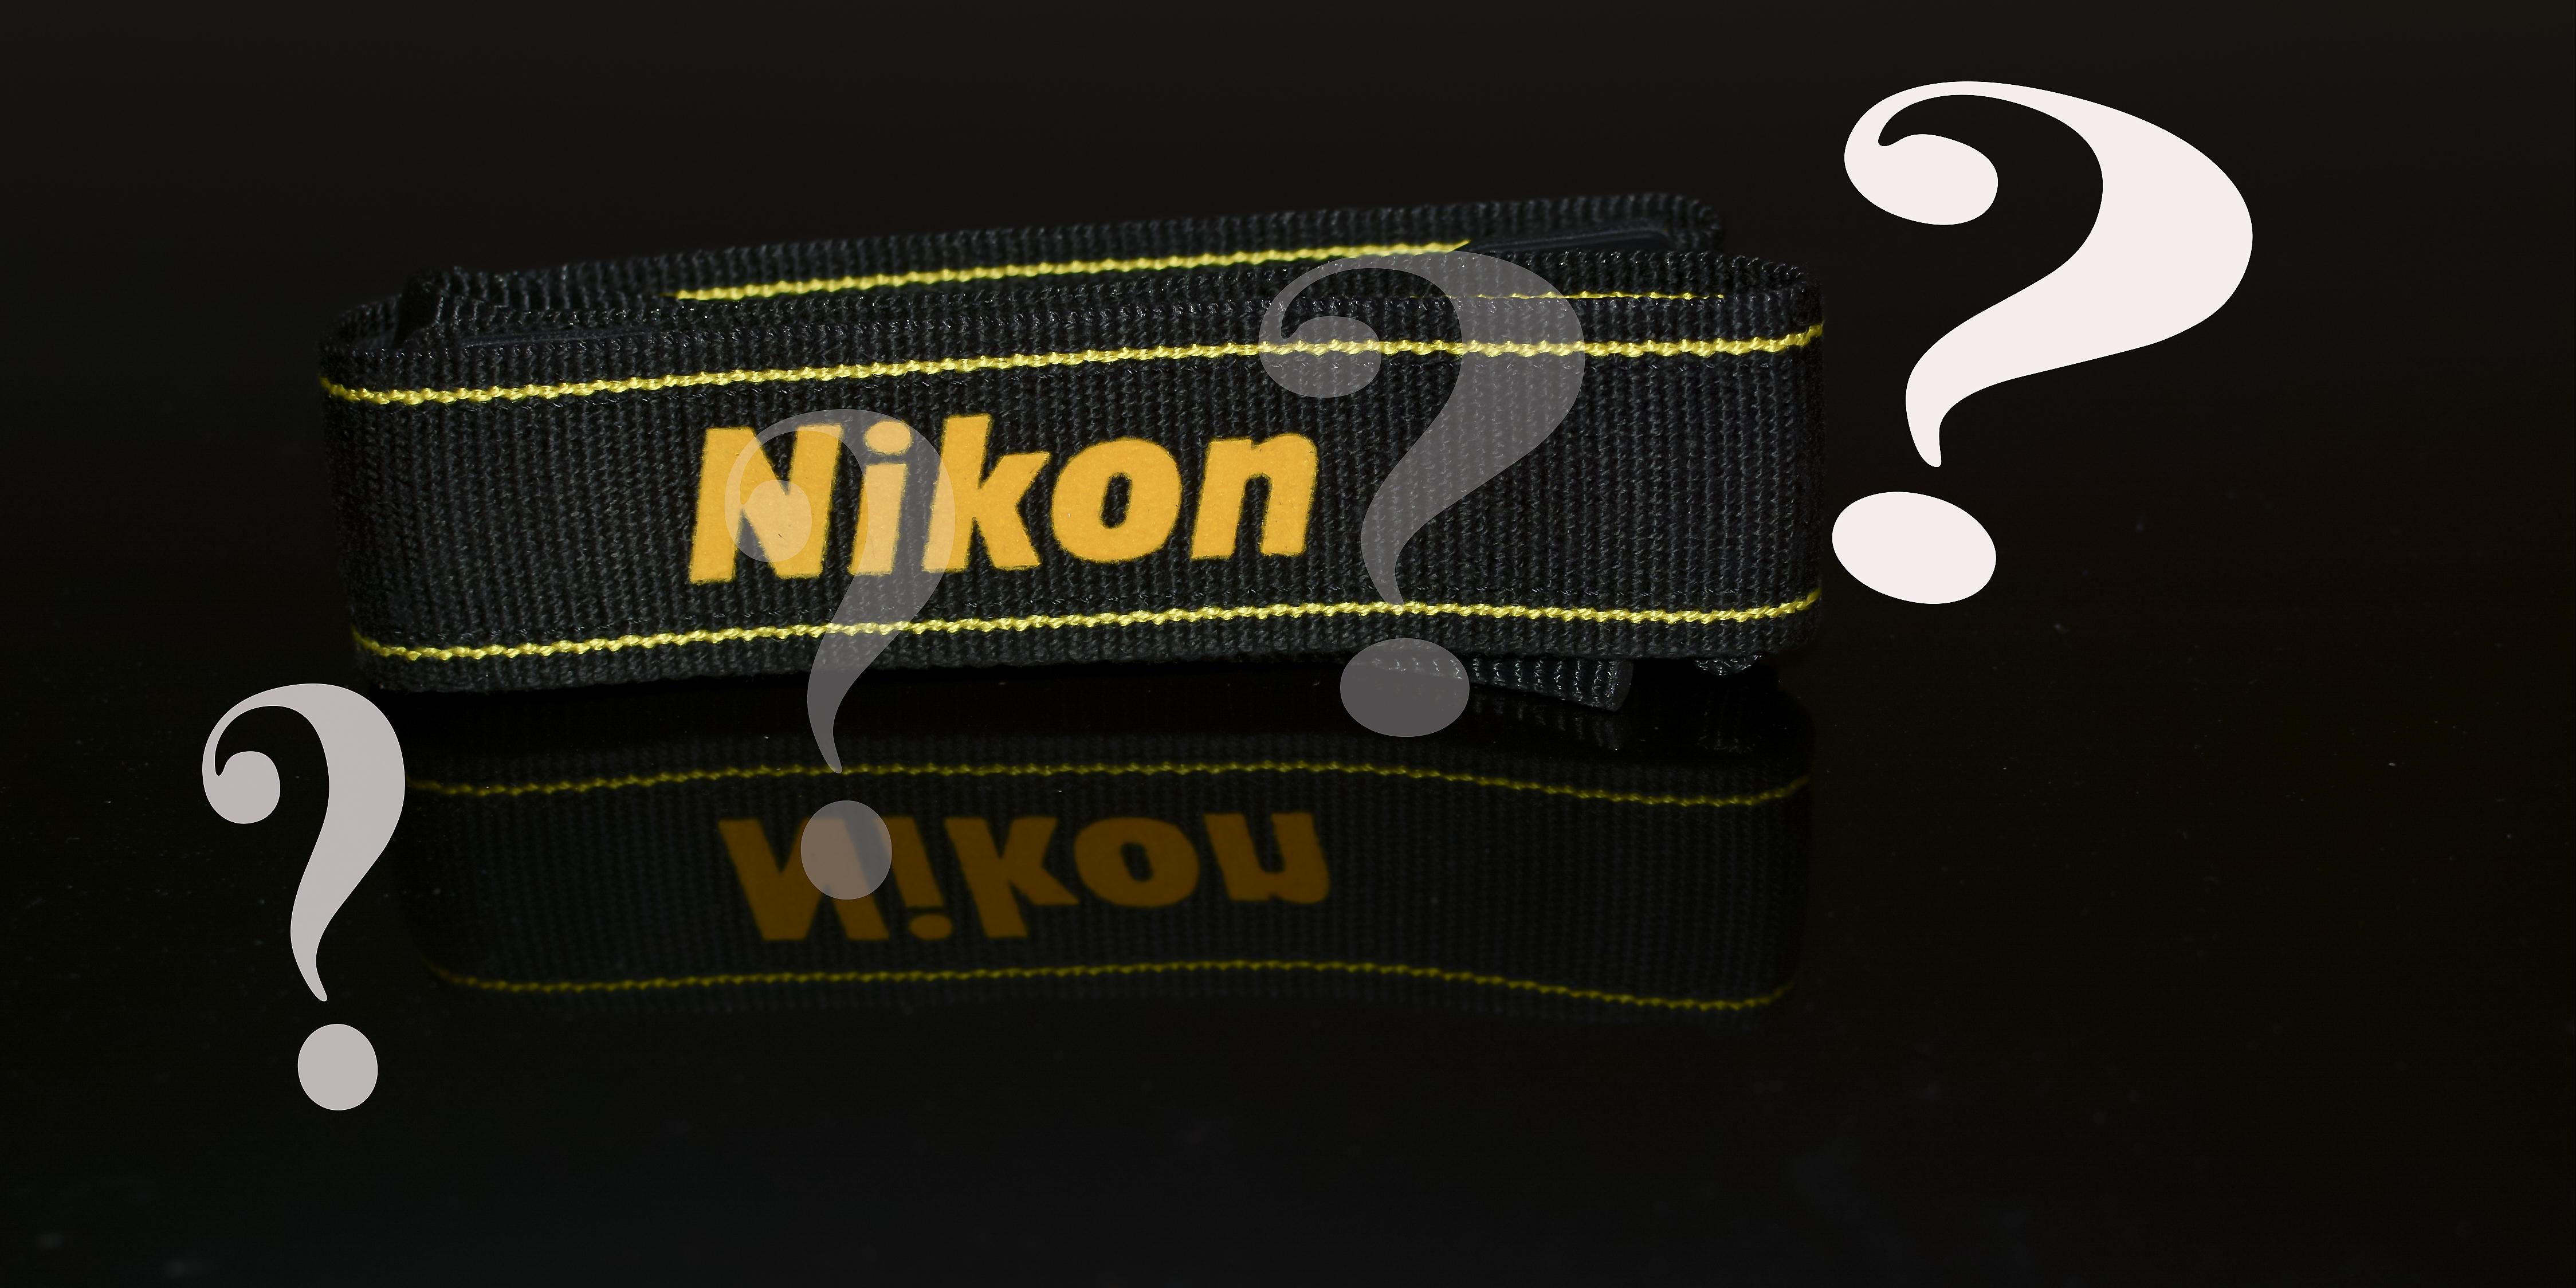 The Best Nikon Cameras 2018